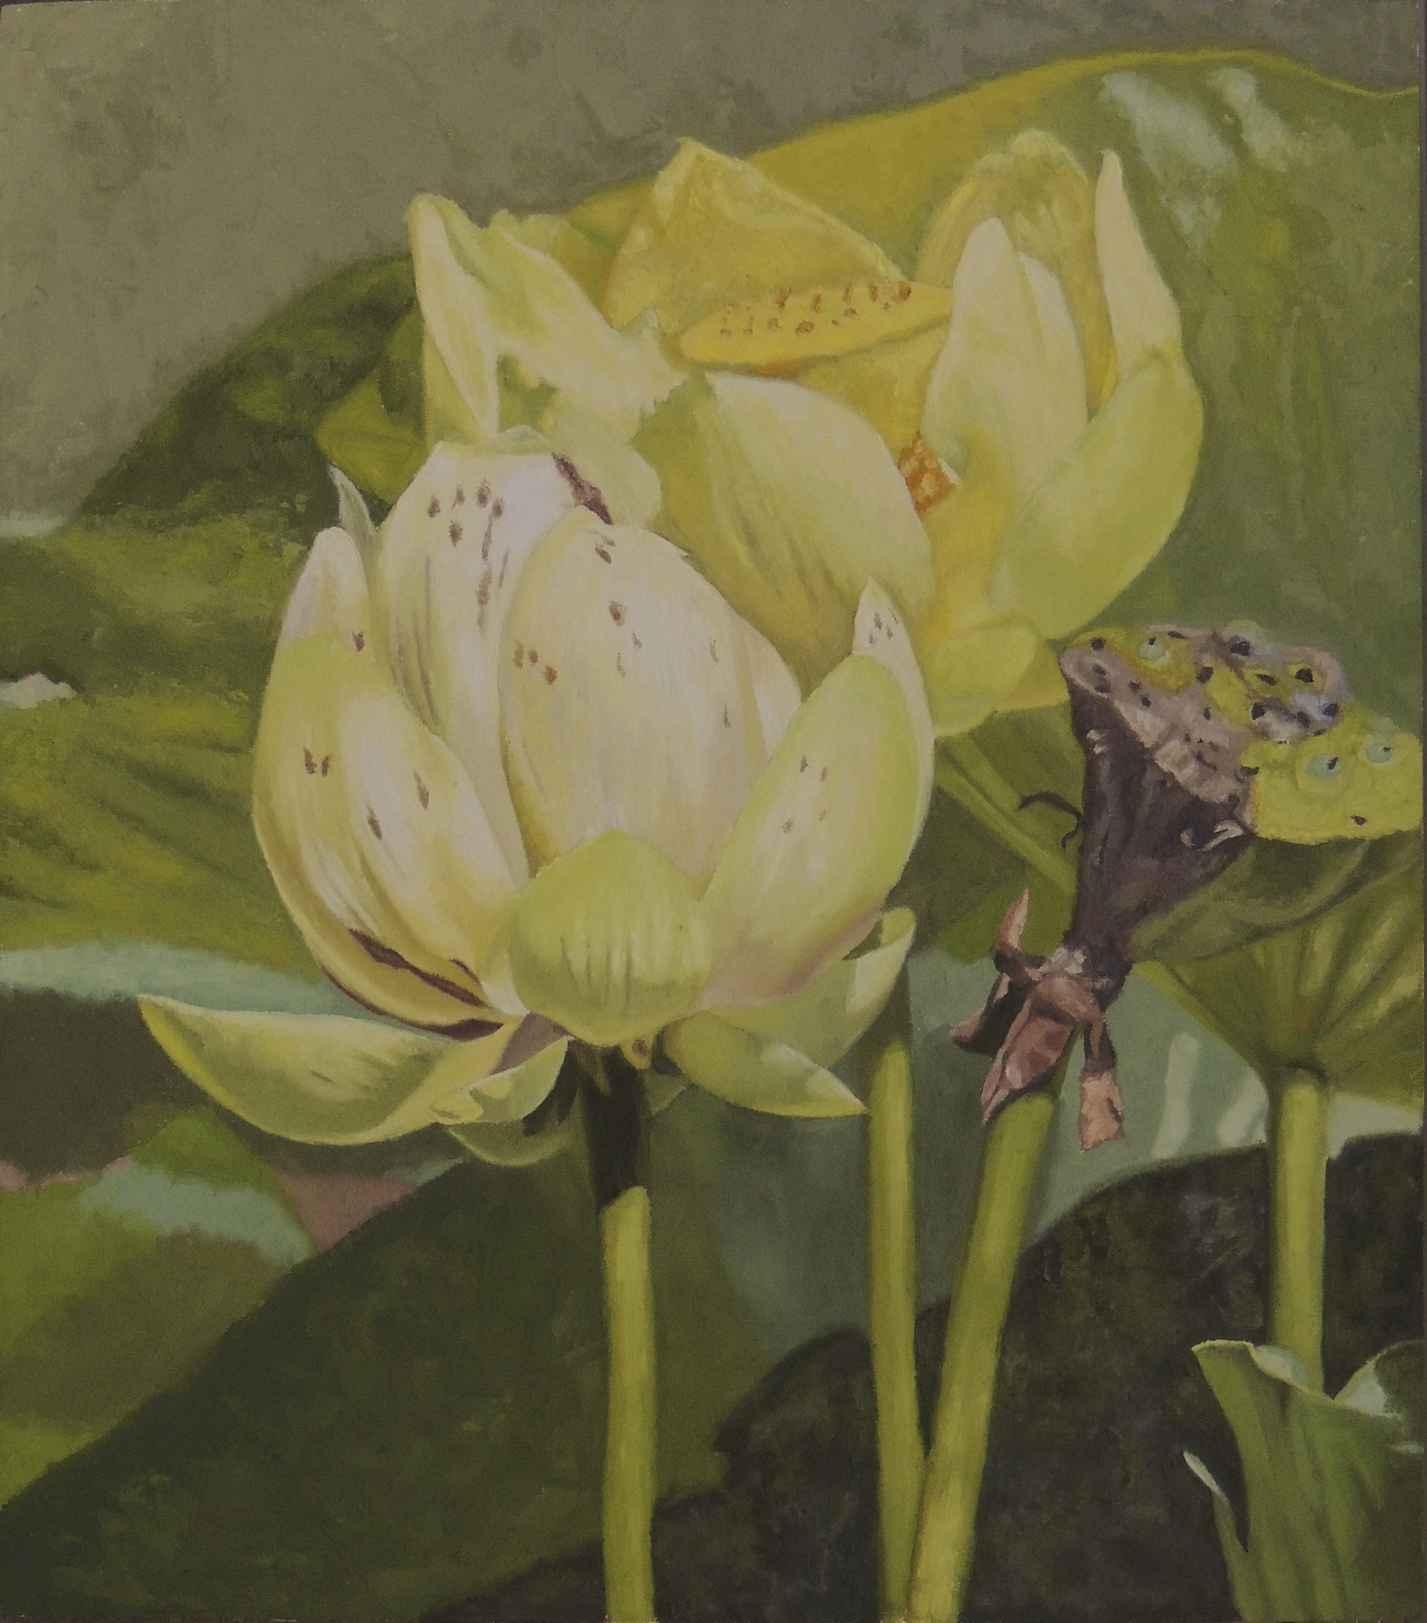 Lotus by  Rusty Frentner - Masterpiece Online